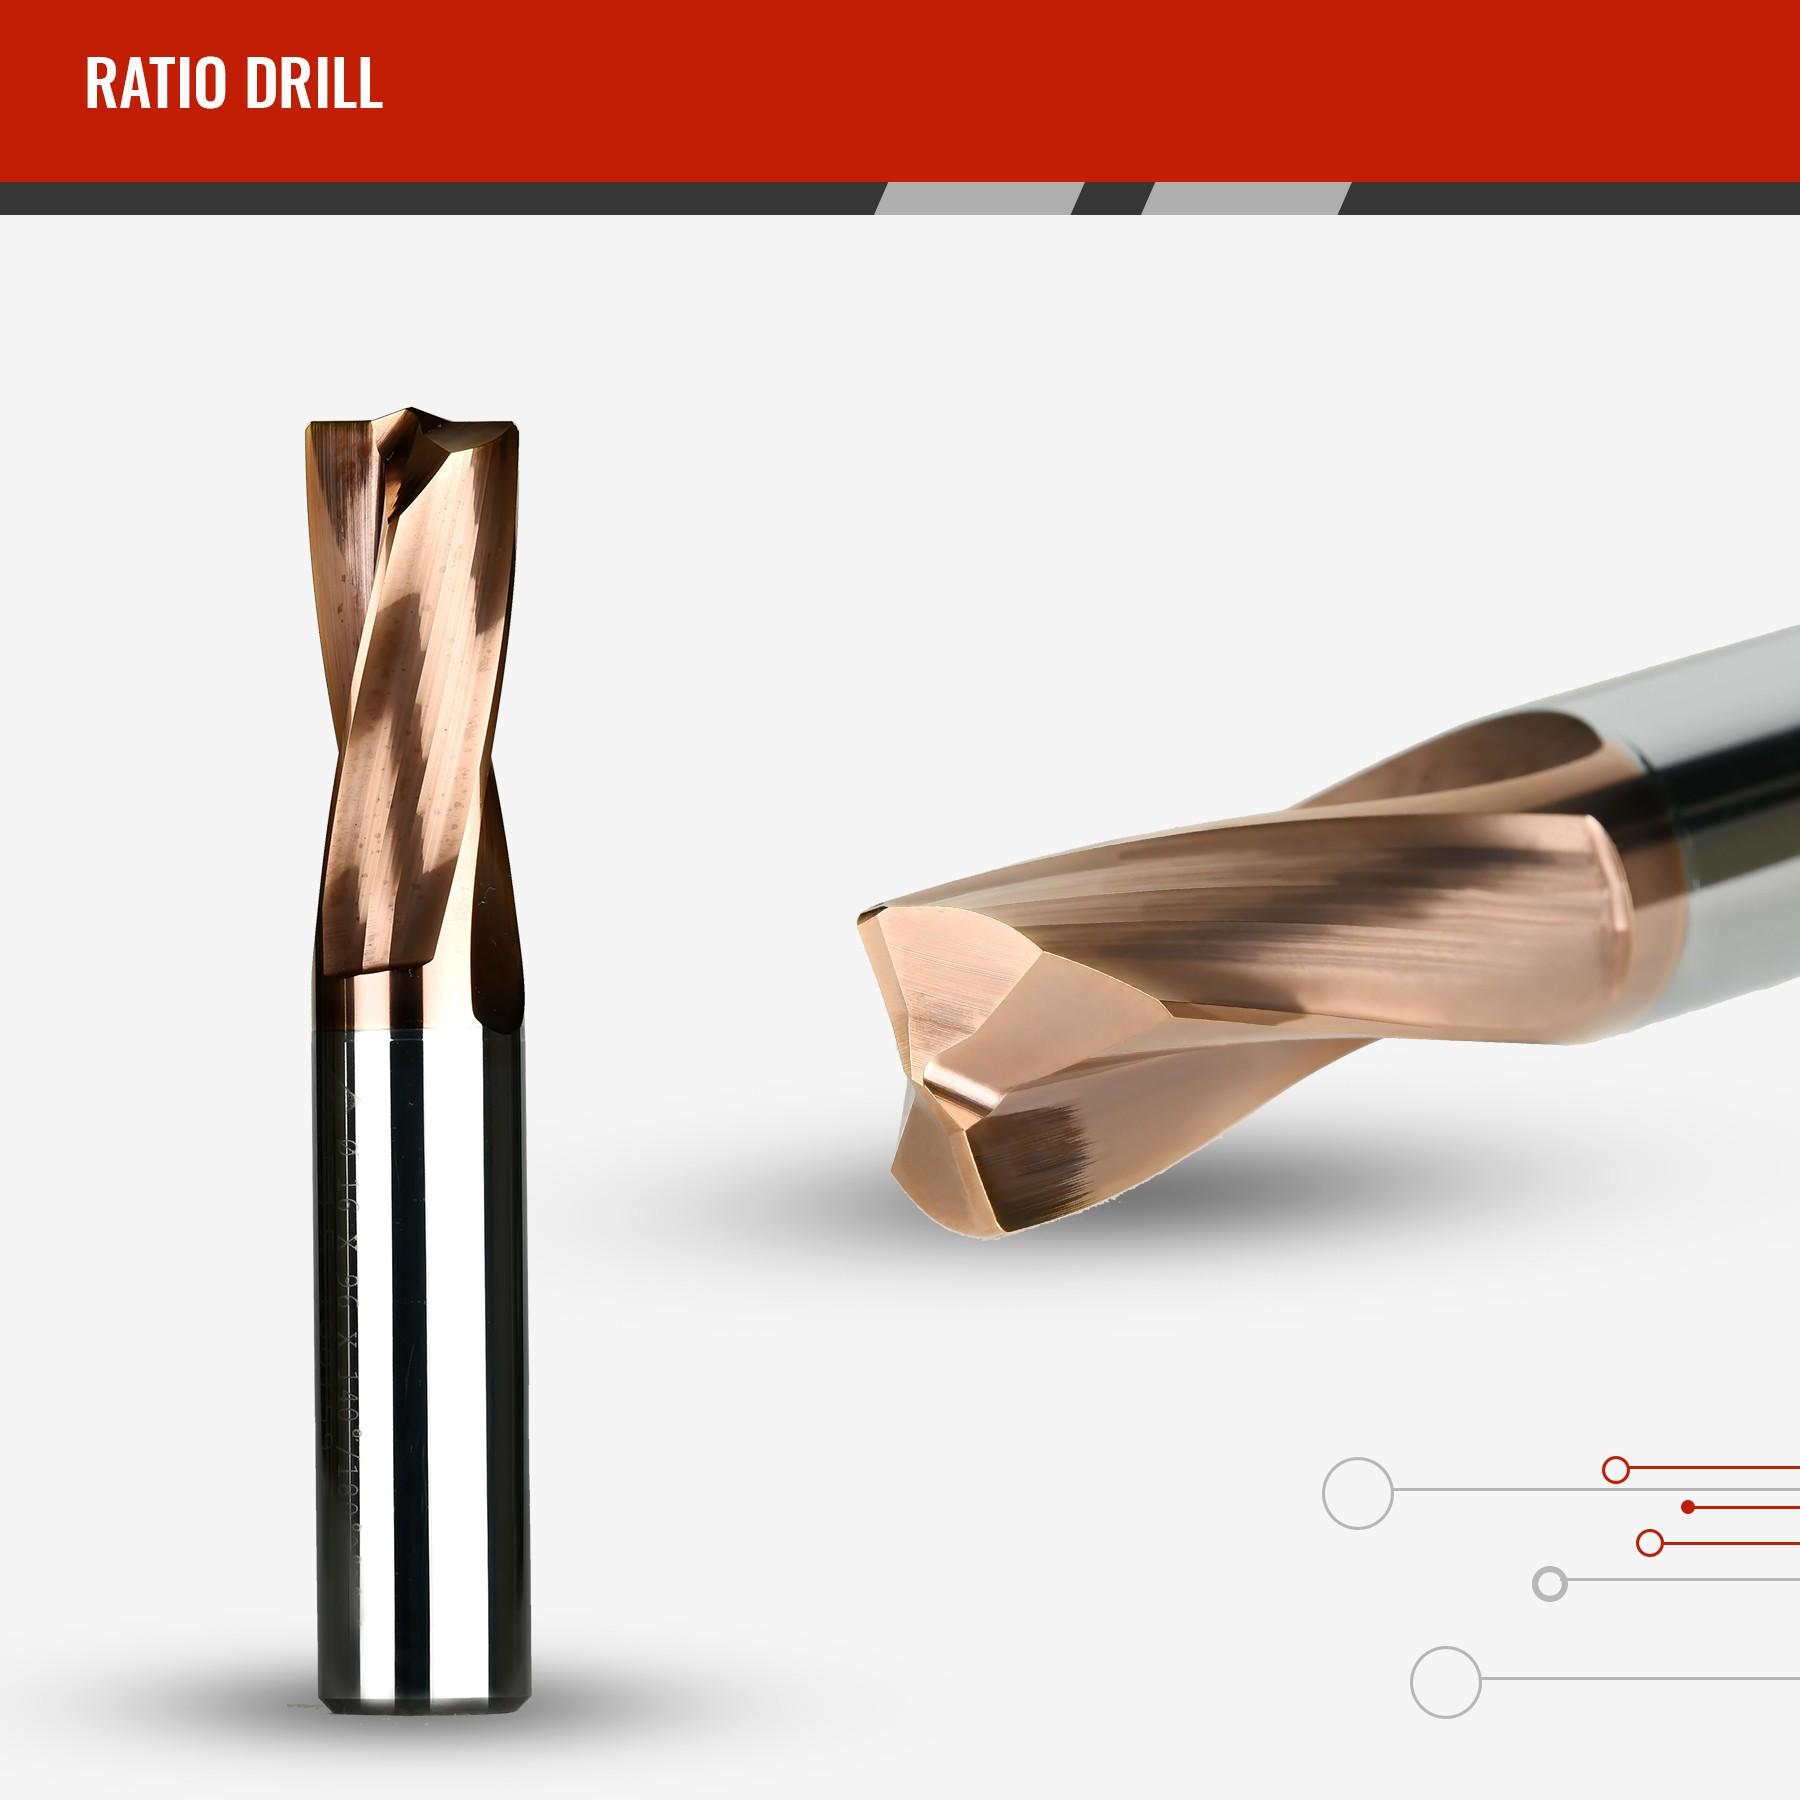 Ratio Drills